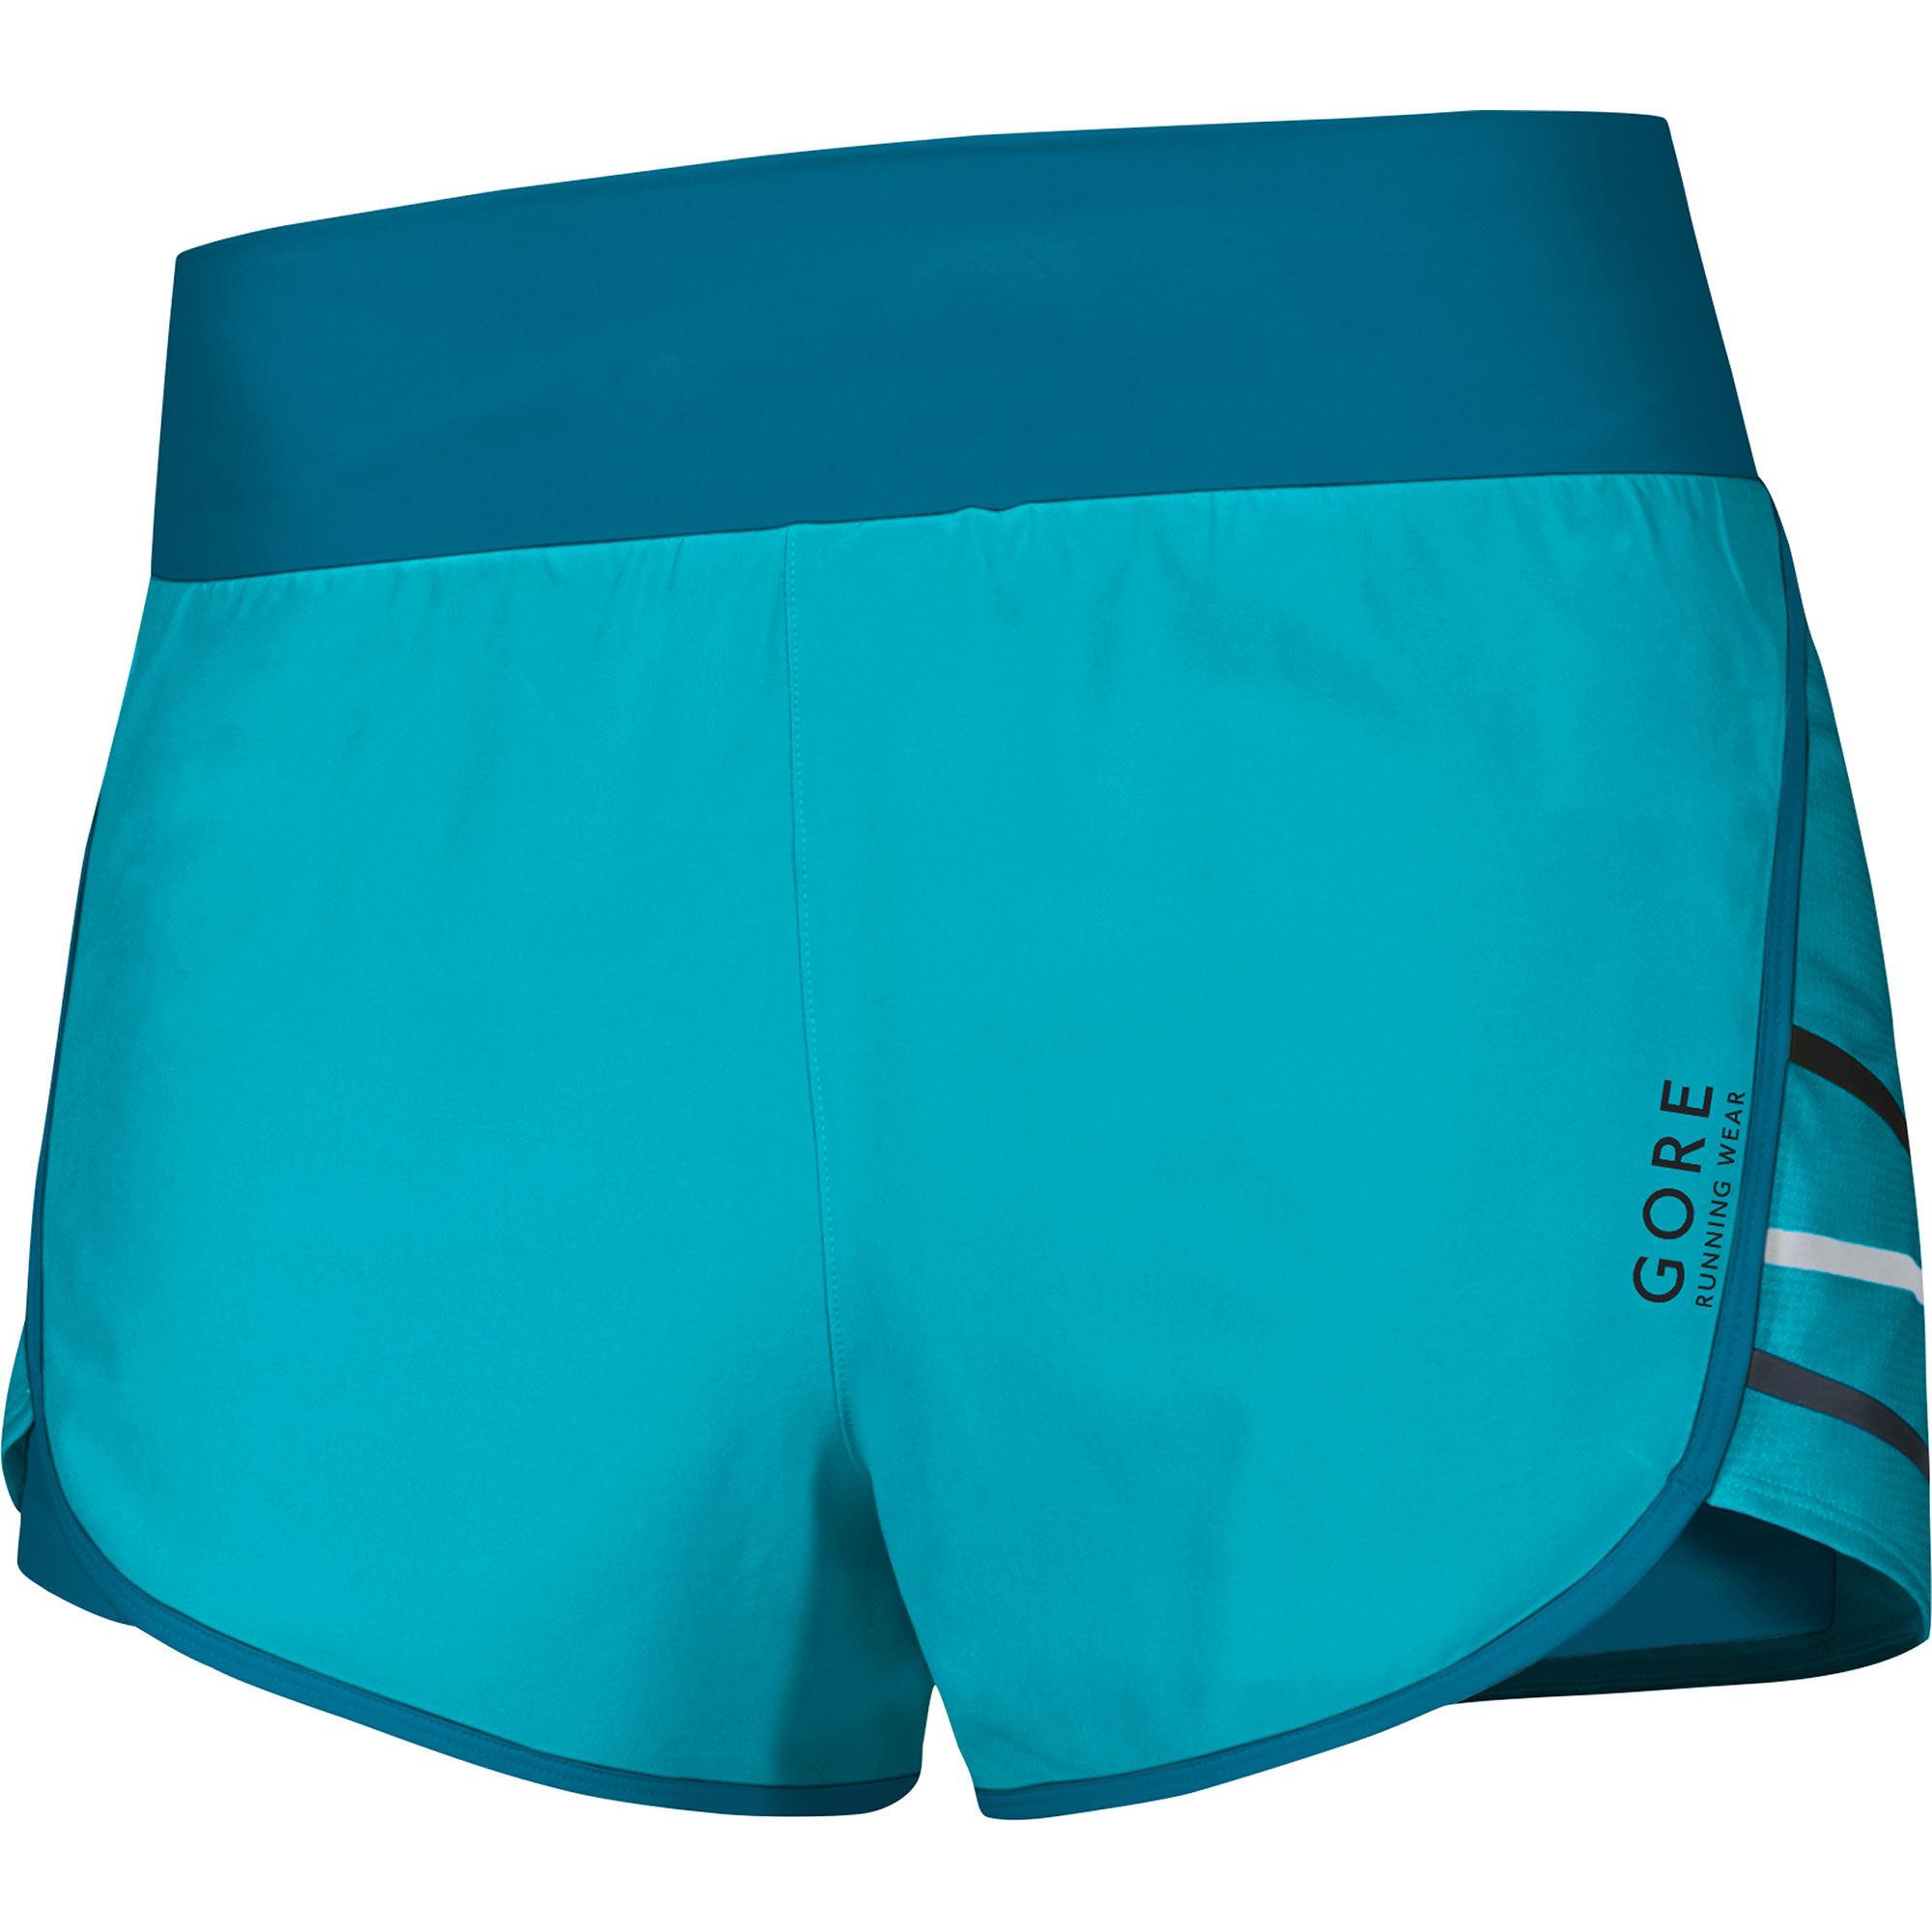 Gore Mythos Lady 2in1 Short in Blau